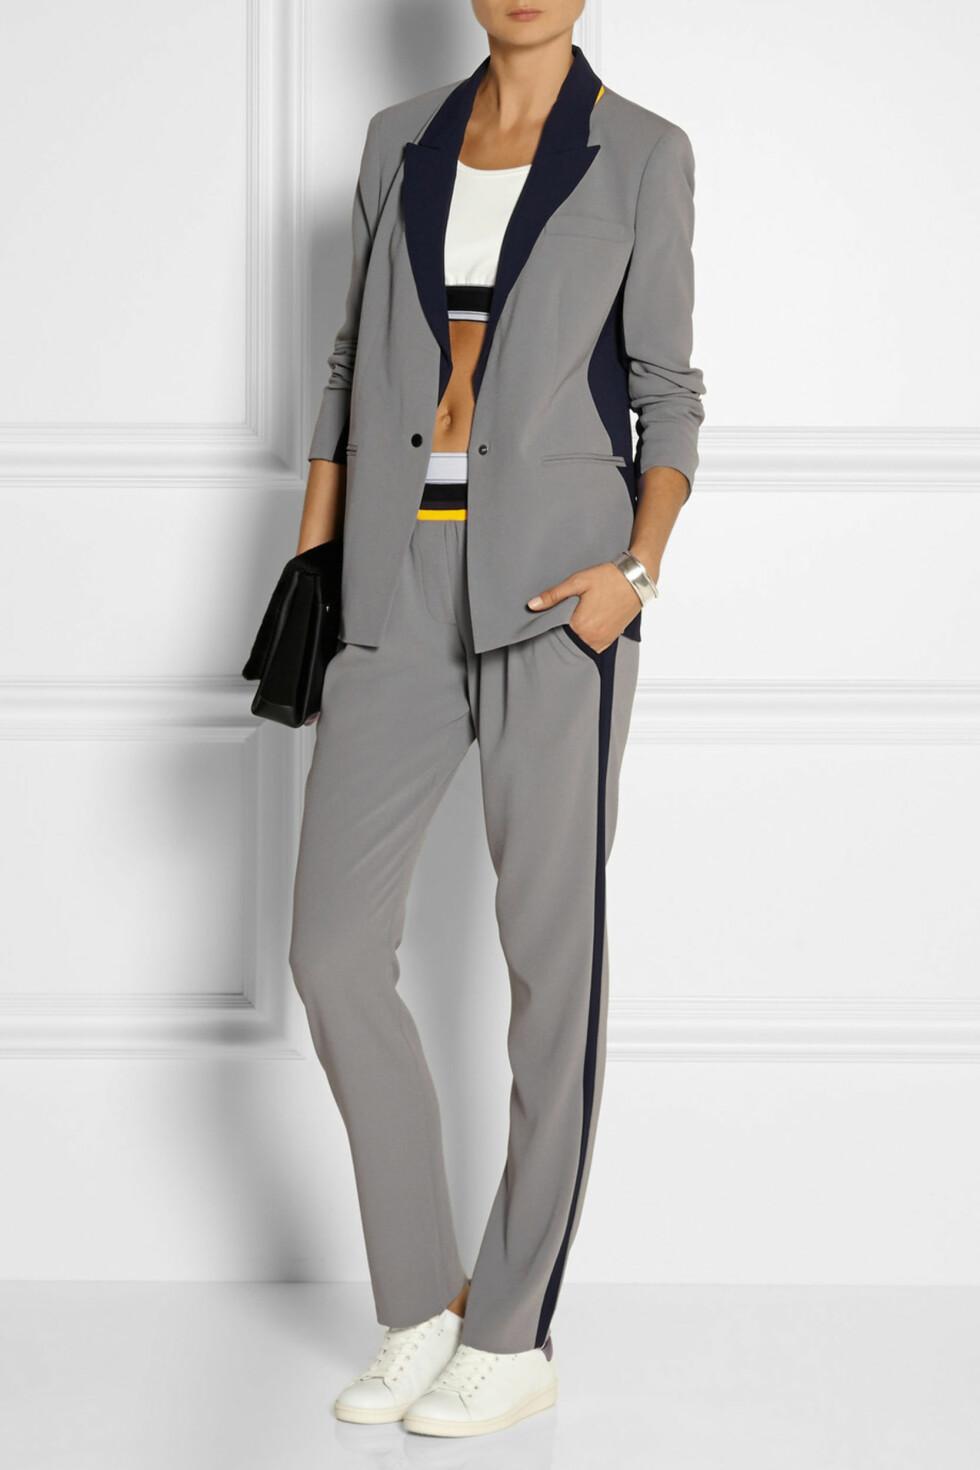 Blazer og bukse fra DKNY + Cara Delevingne via Net-a-porter.com, 2600 kr og 2056 kr. Foto: Net-a-porter.com